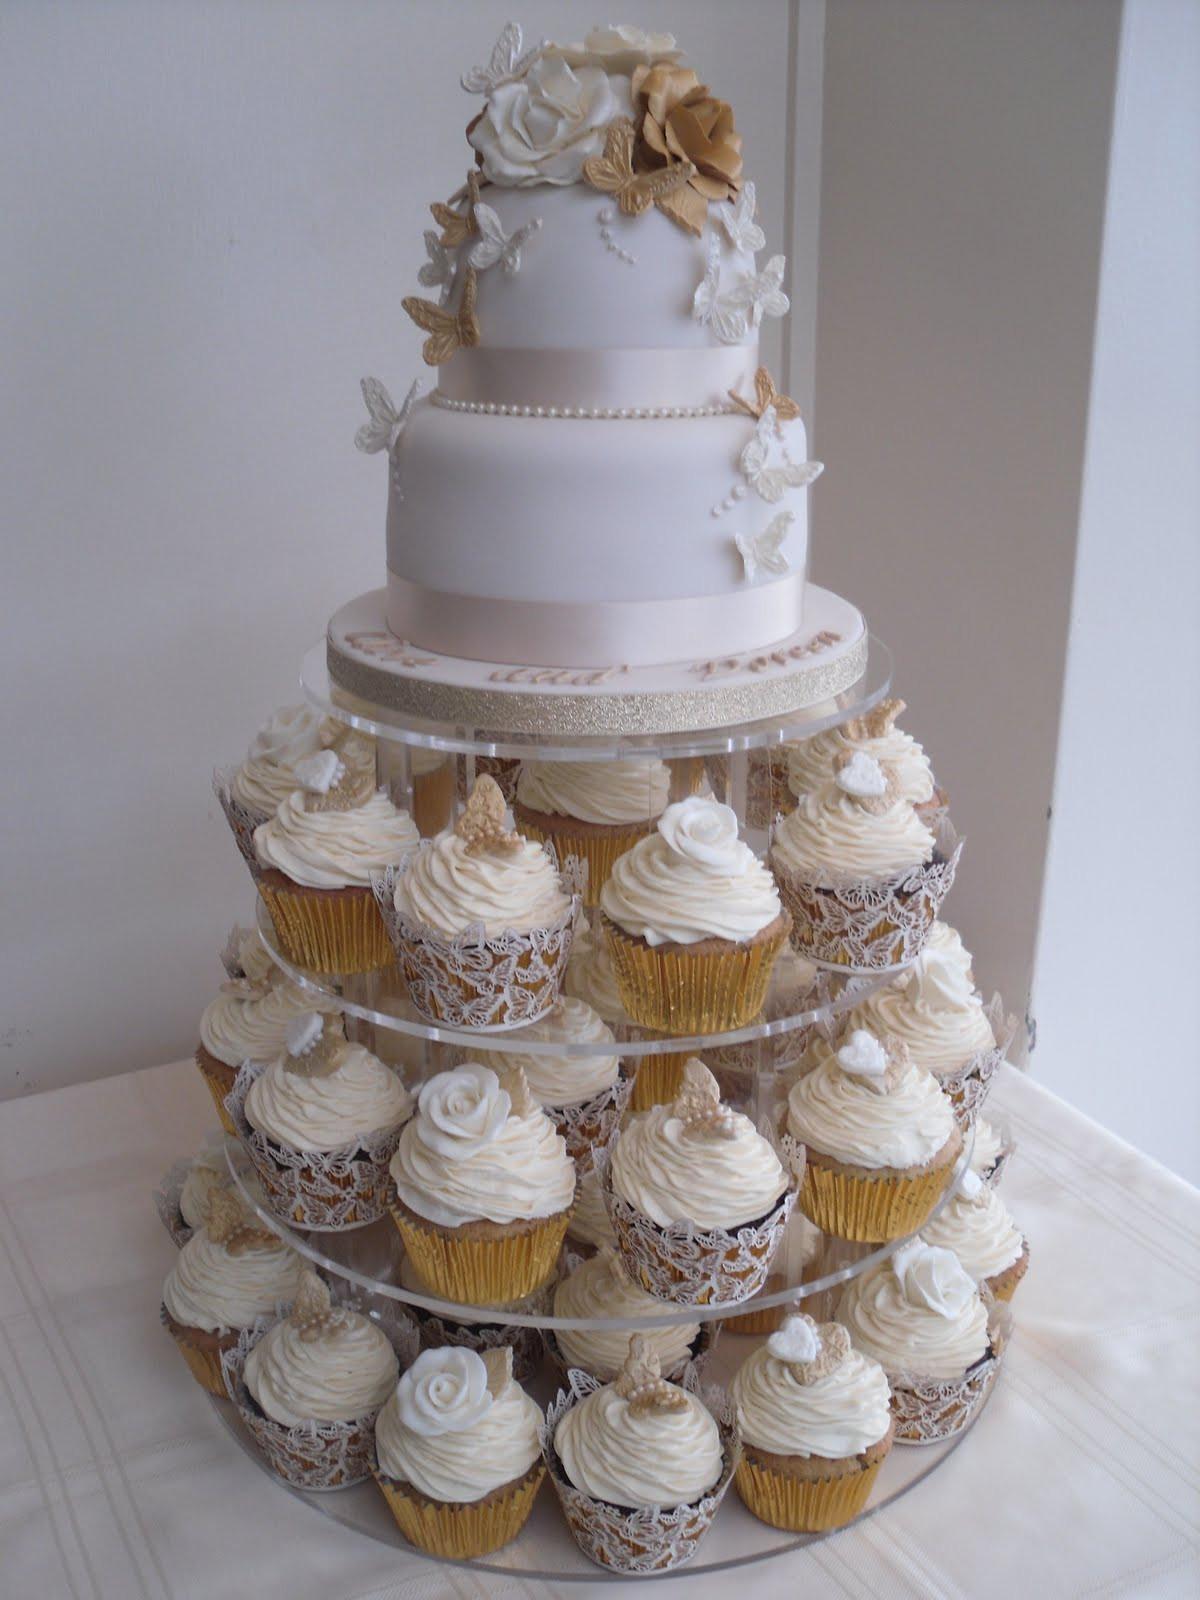 Wedding Cakes And Cupcake Ideas  Katies Cupcakes Golden Wedding Anniversary